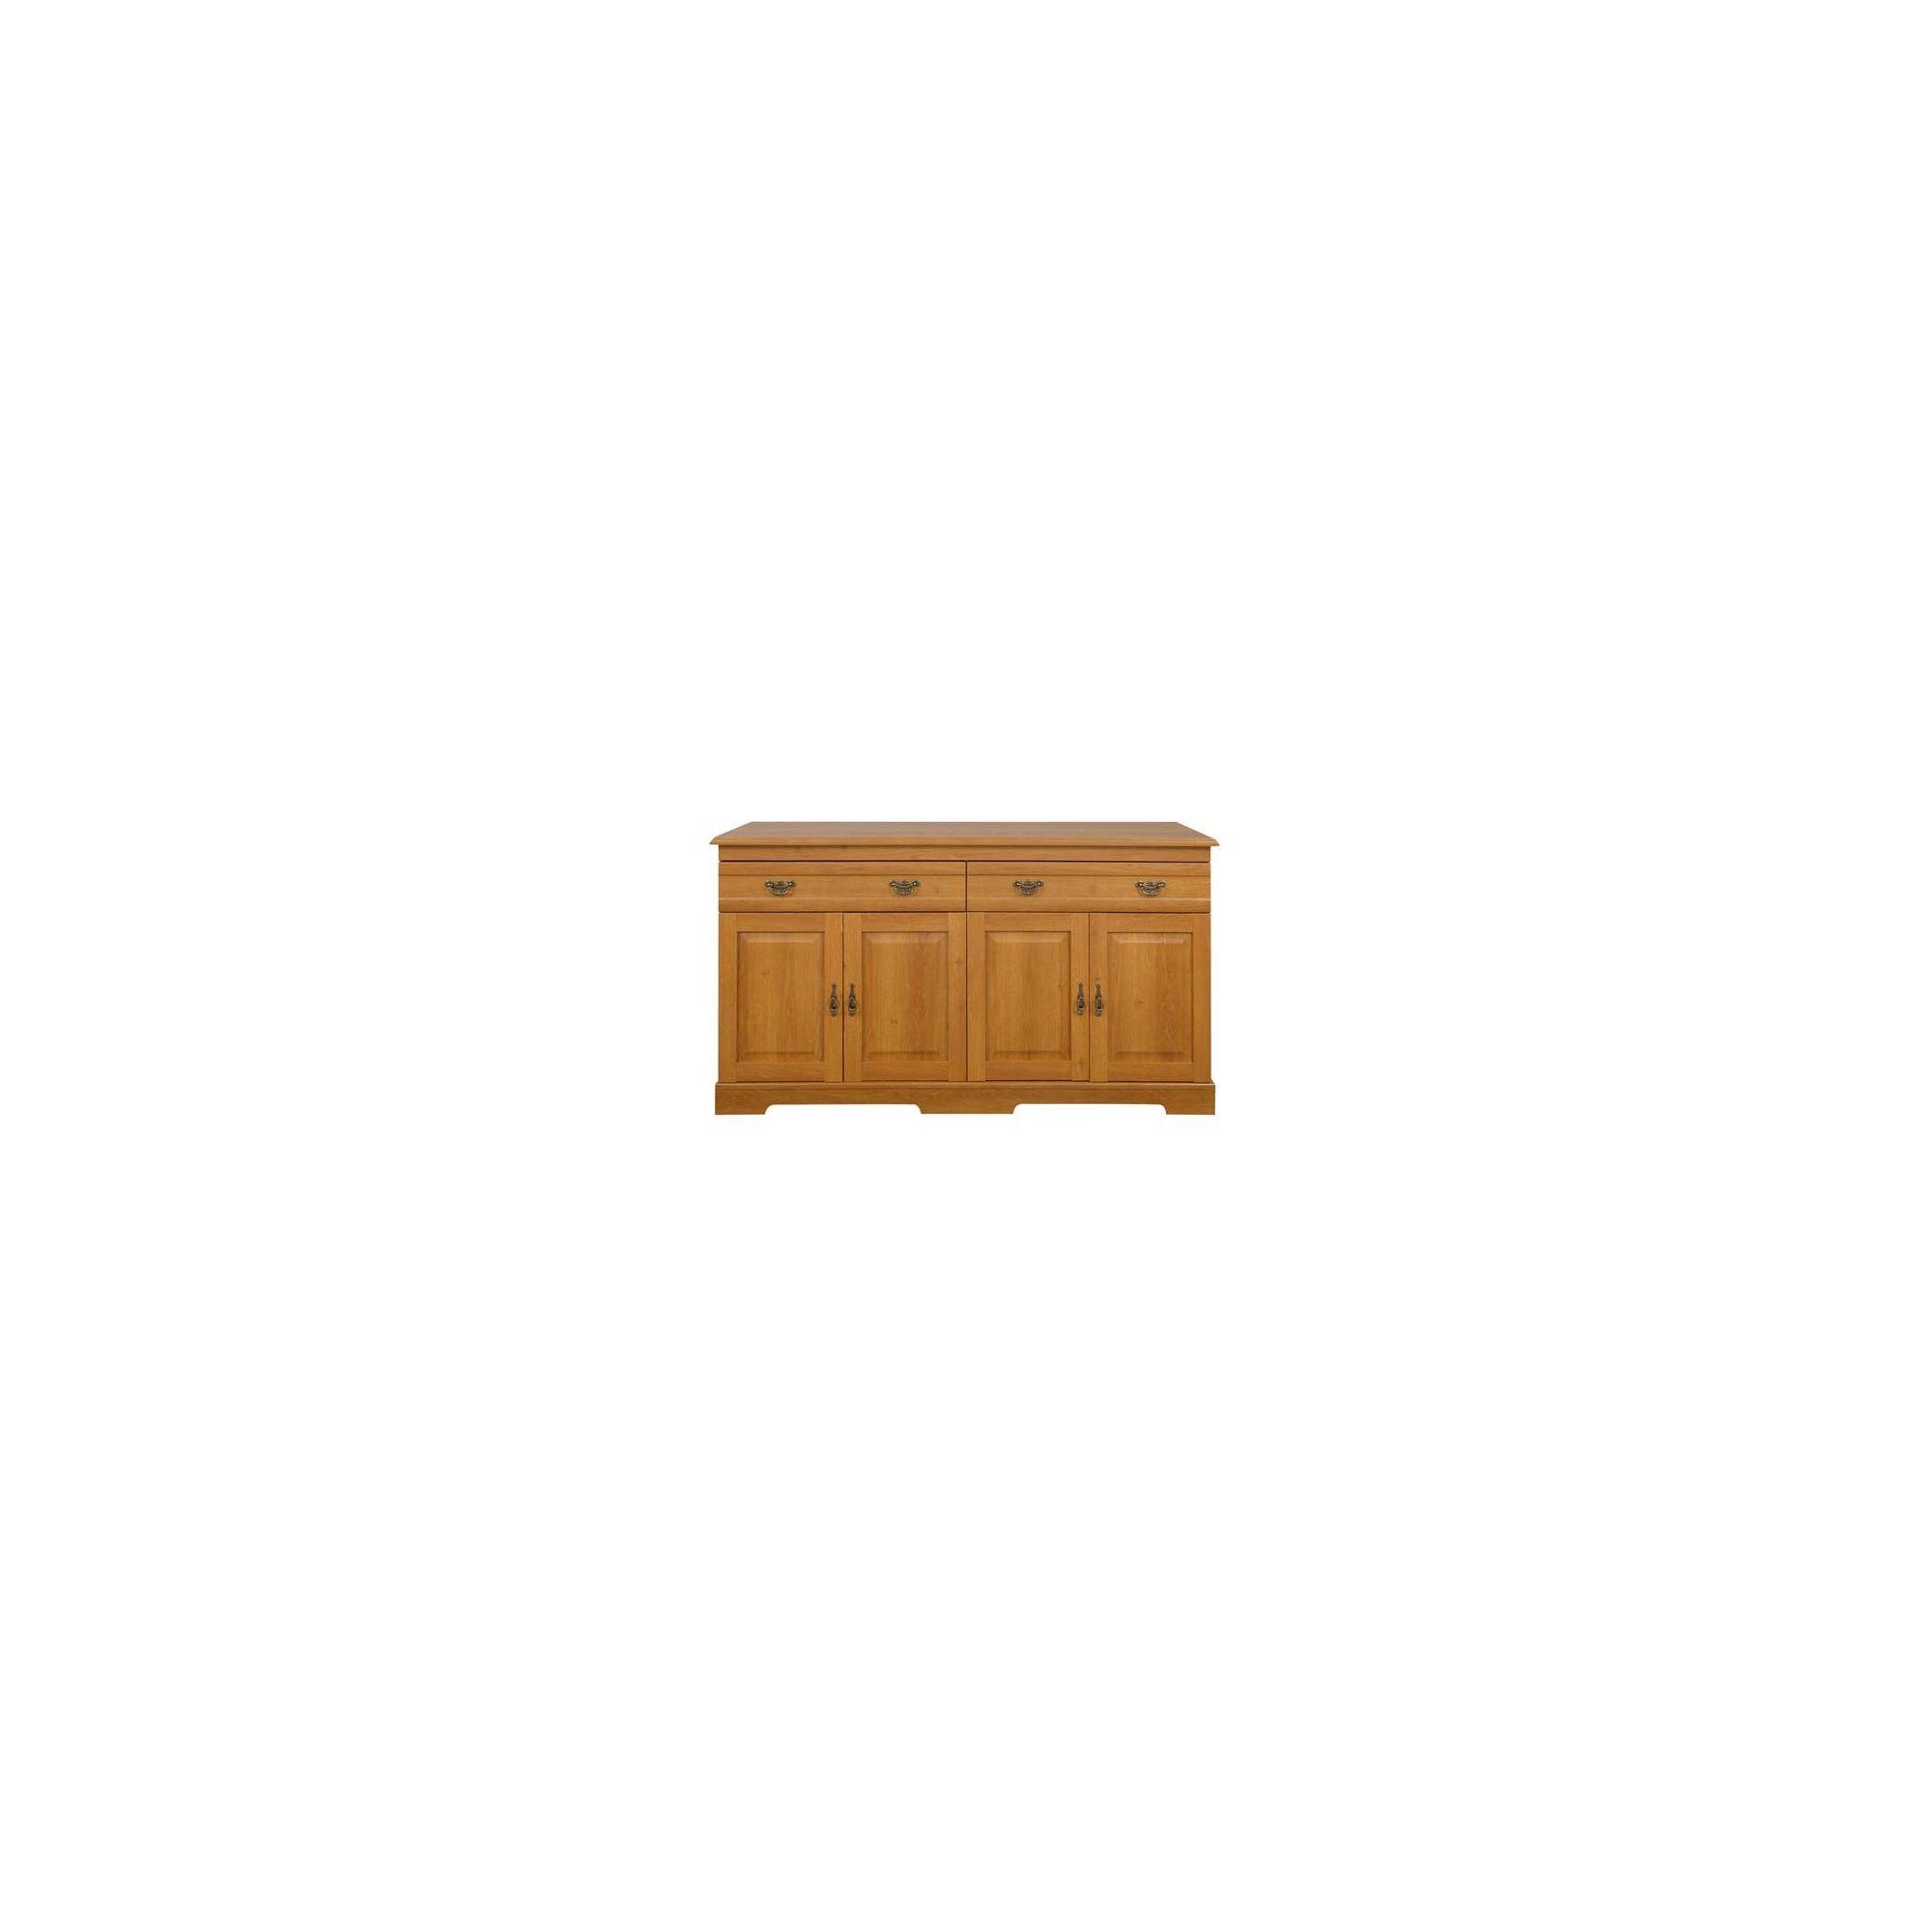 Caxton Canterbury 4 Door / 2 Drawer Sideboard in Golden Chestnut at Tesco Direct